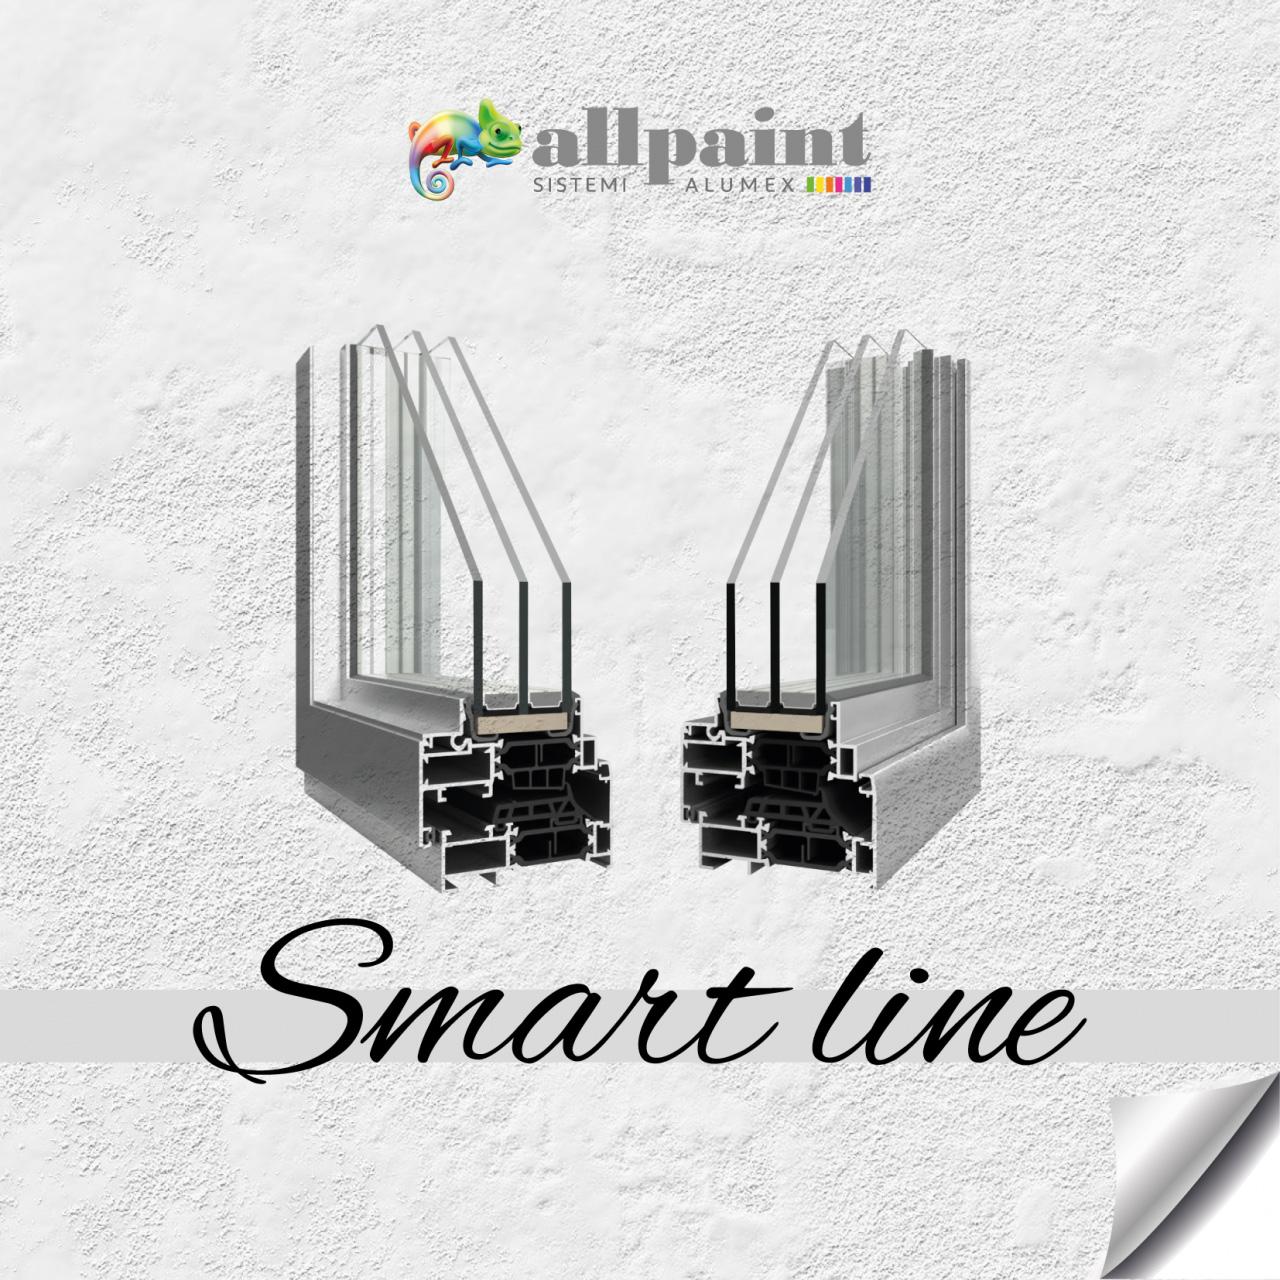 https://www.allpaint.it/wp-content/uploads/2021/09/SMART-LINE-ALLPAINT-1280x1280-1.jpg